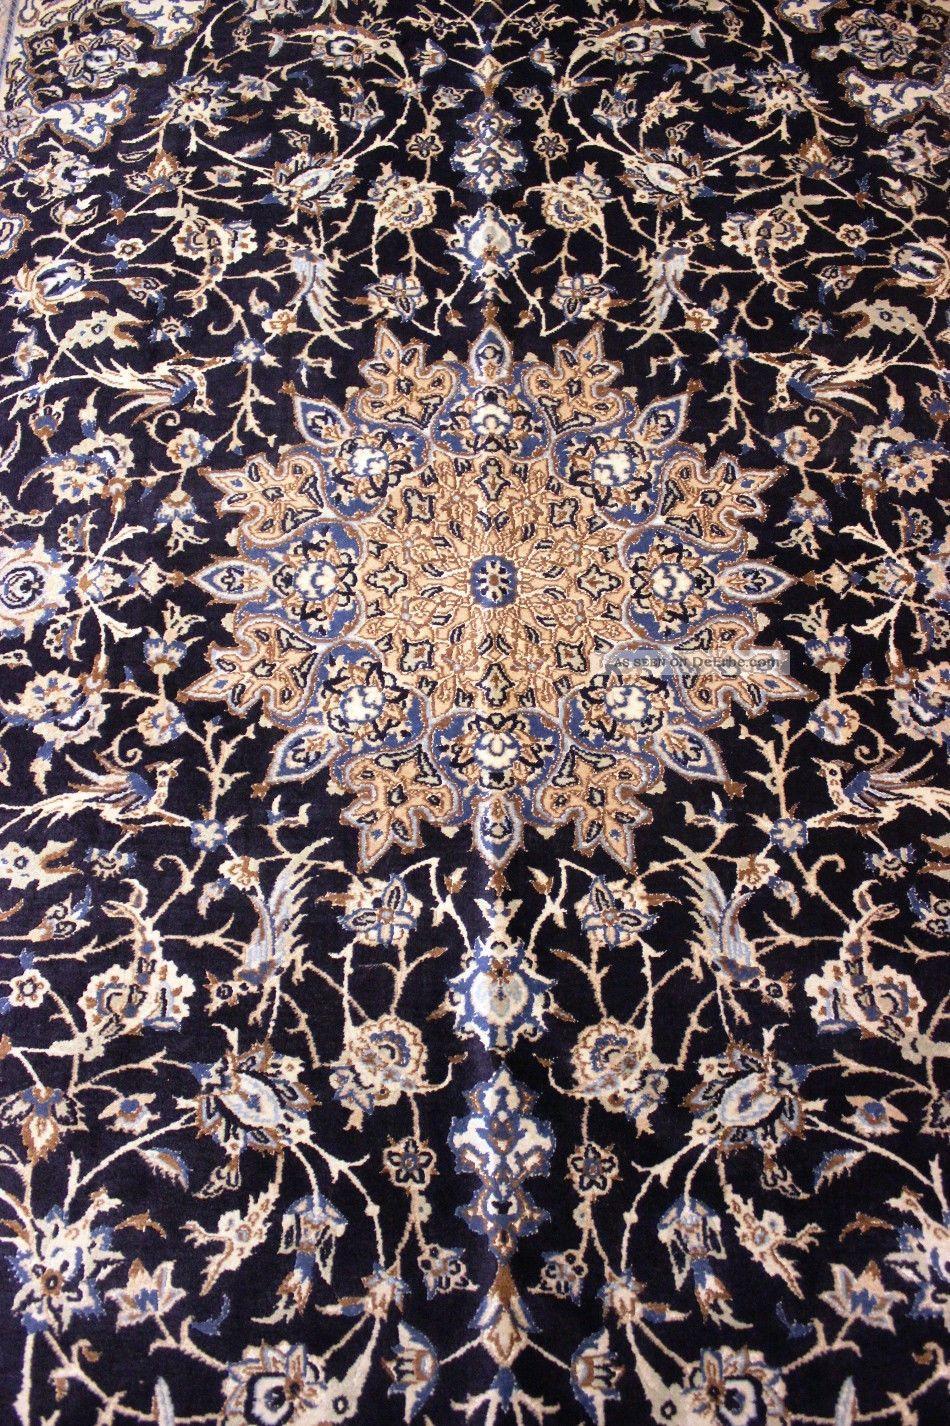 k niglicher 9la habibian nain m seide tiermotive bilder orient teppich 300x200cm. Black Bedroom Furniture Sets. Home Design Ideas